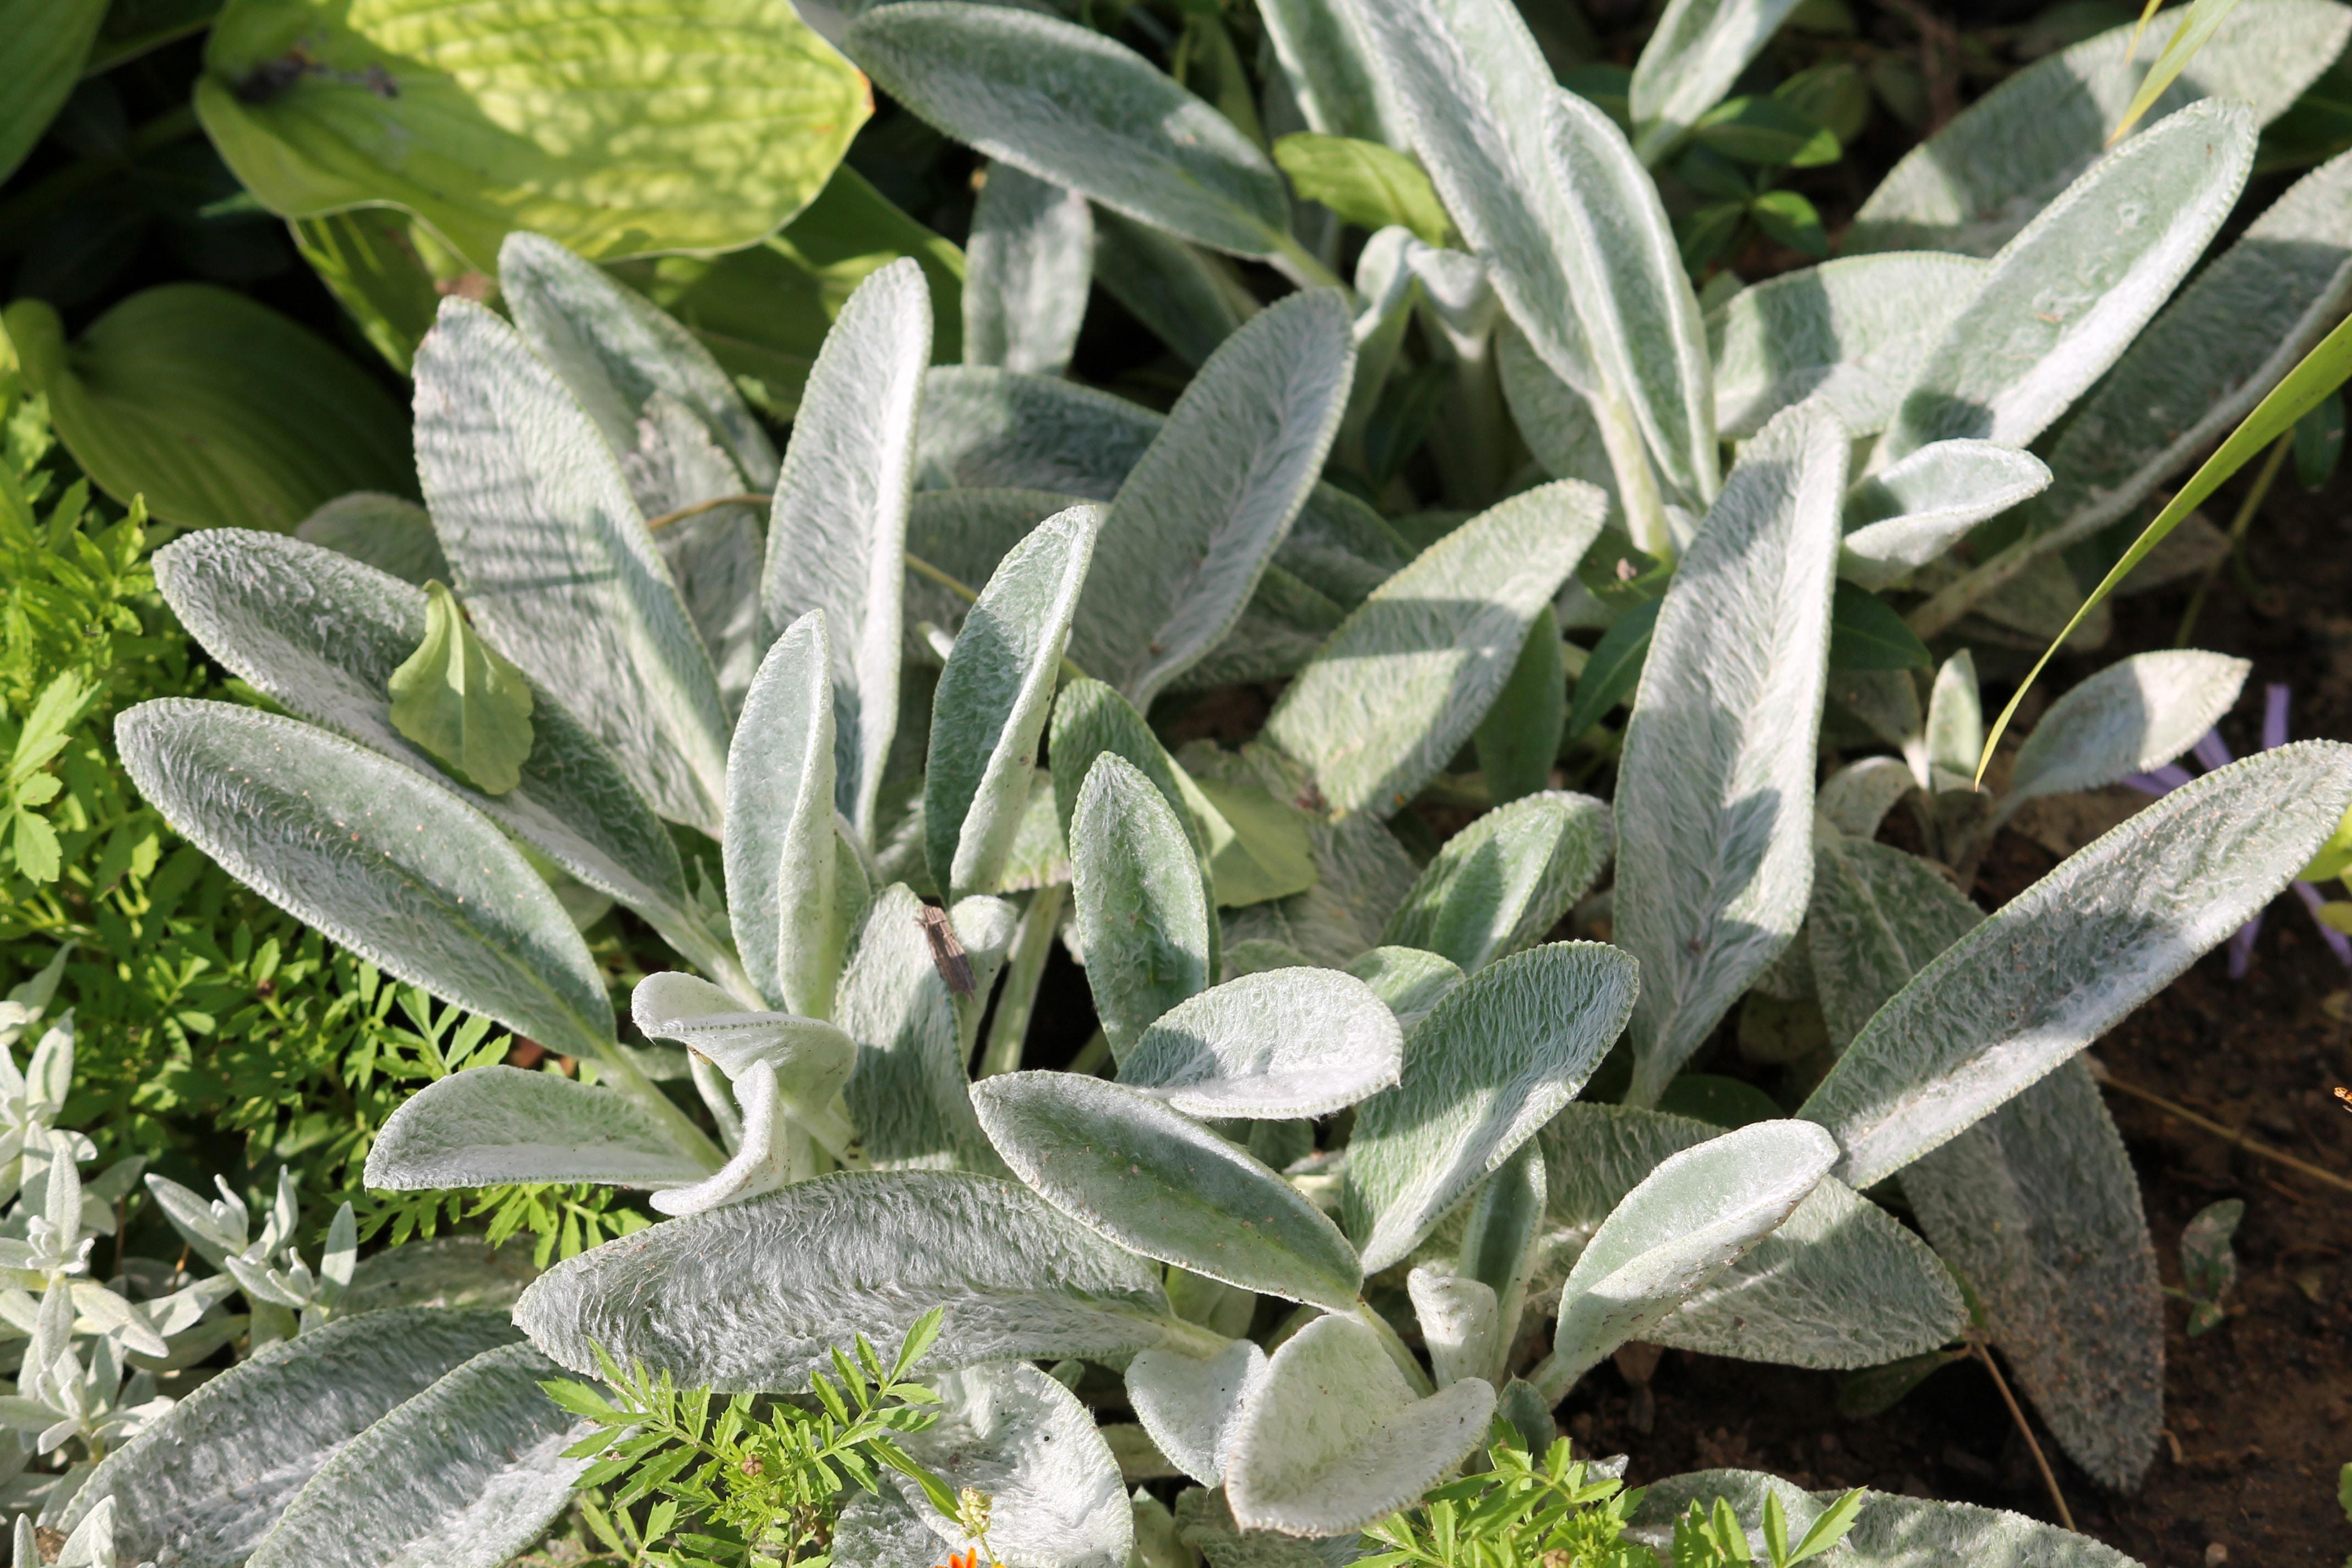 Gray foliage of Stachys byzantina (syn. Stachys lanata) or lamb's ears plant in garden